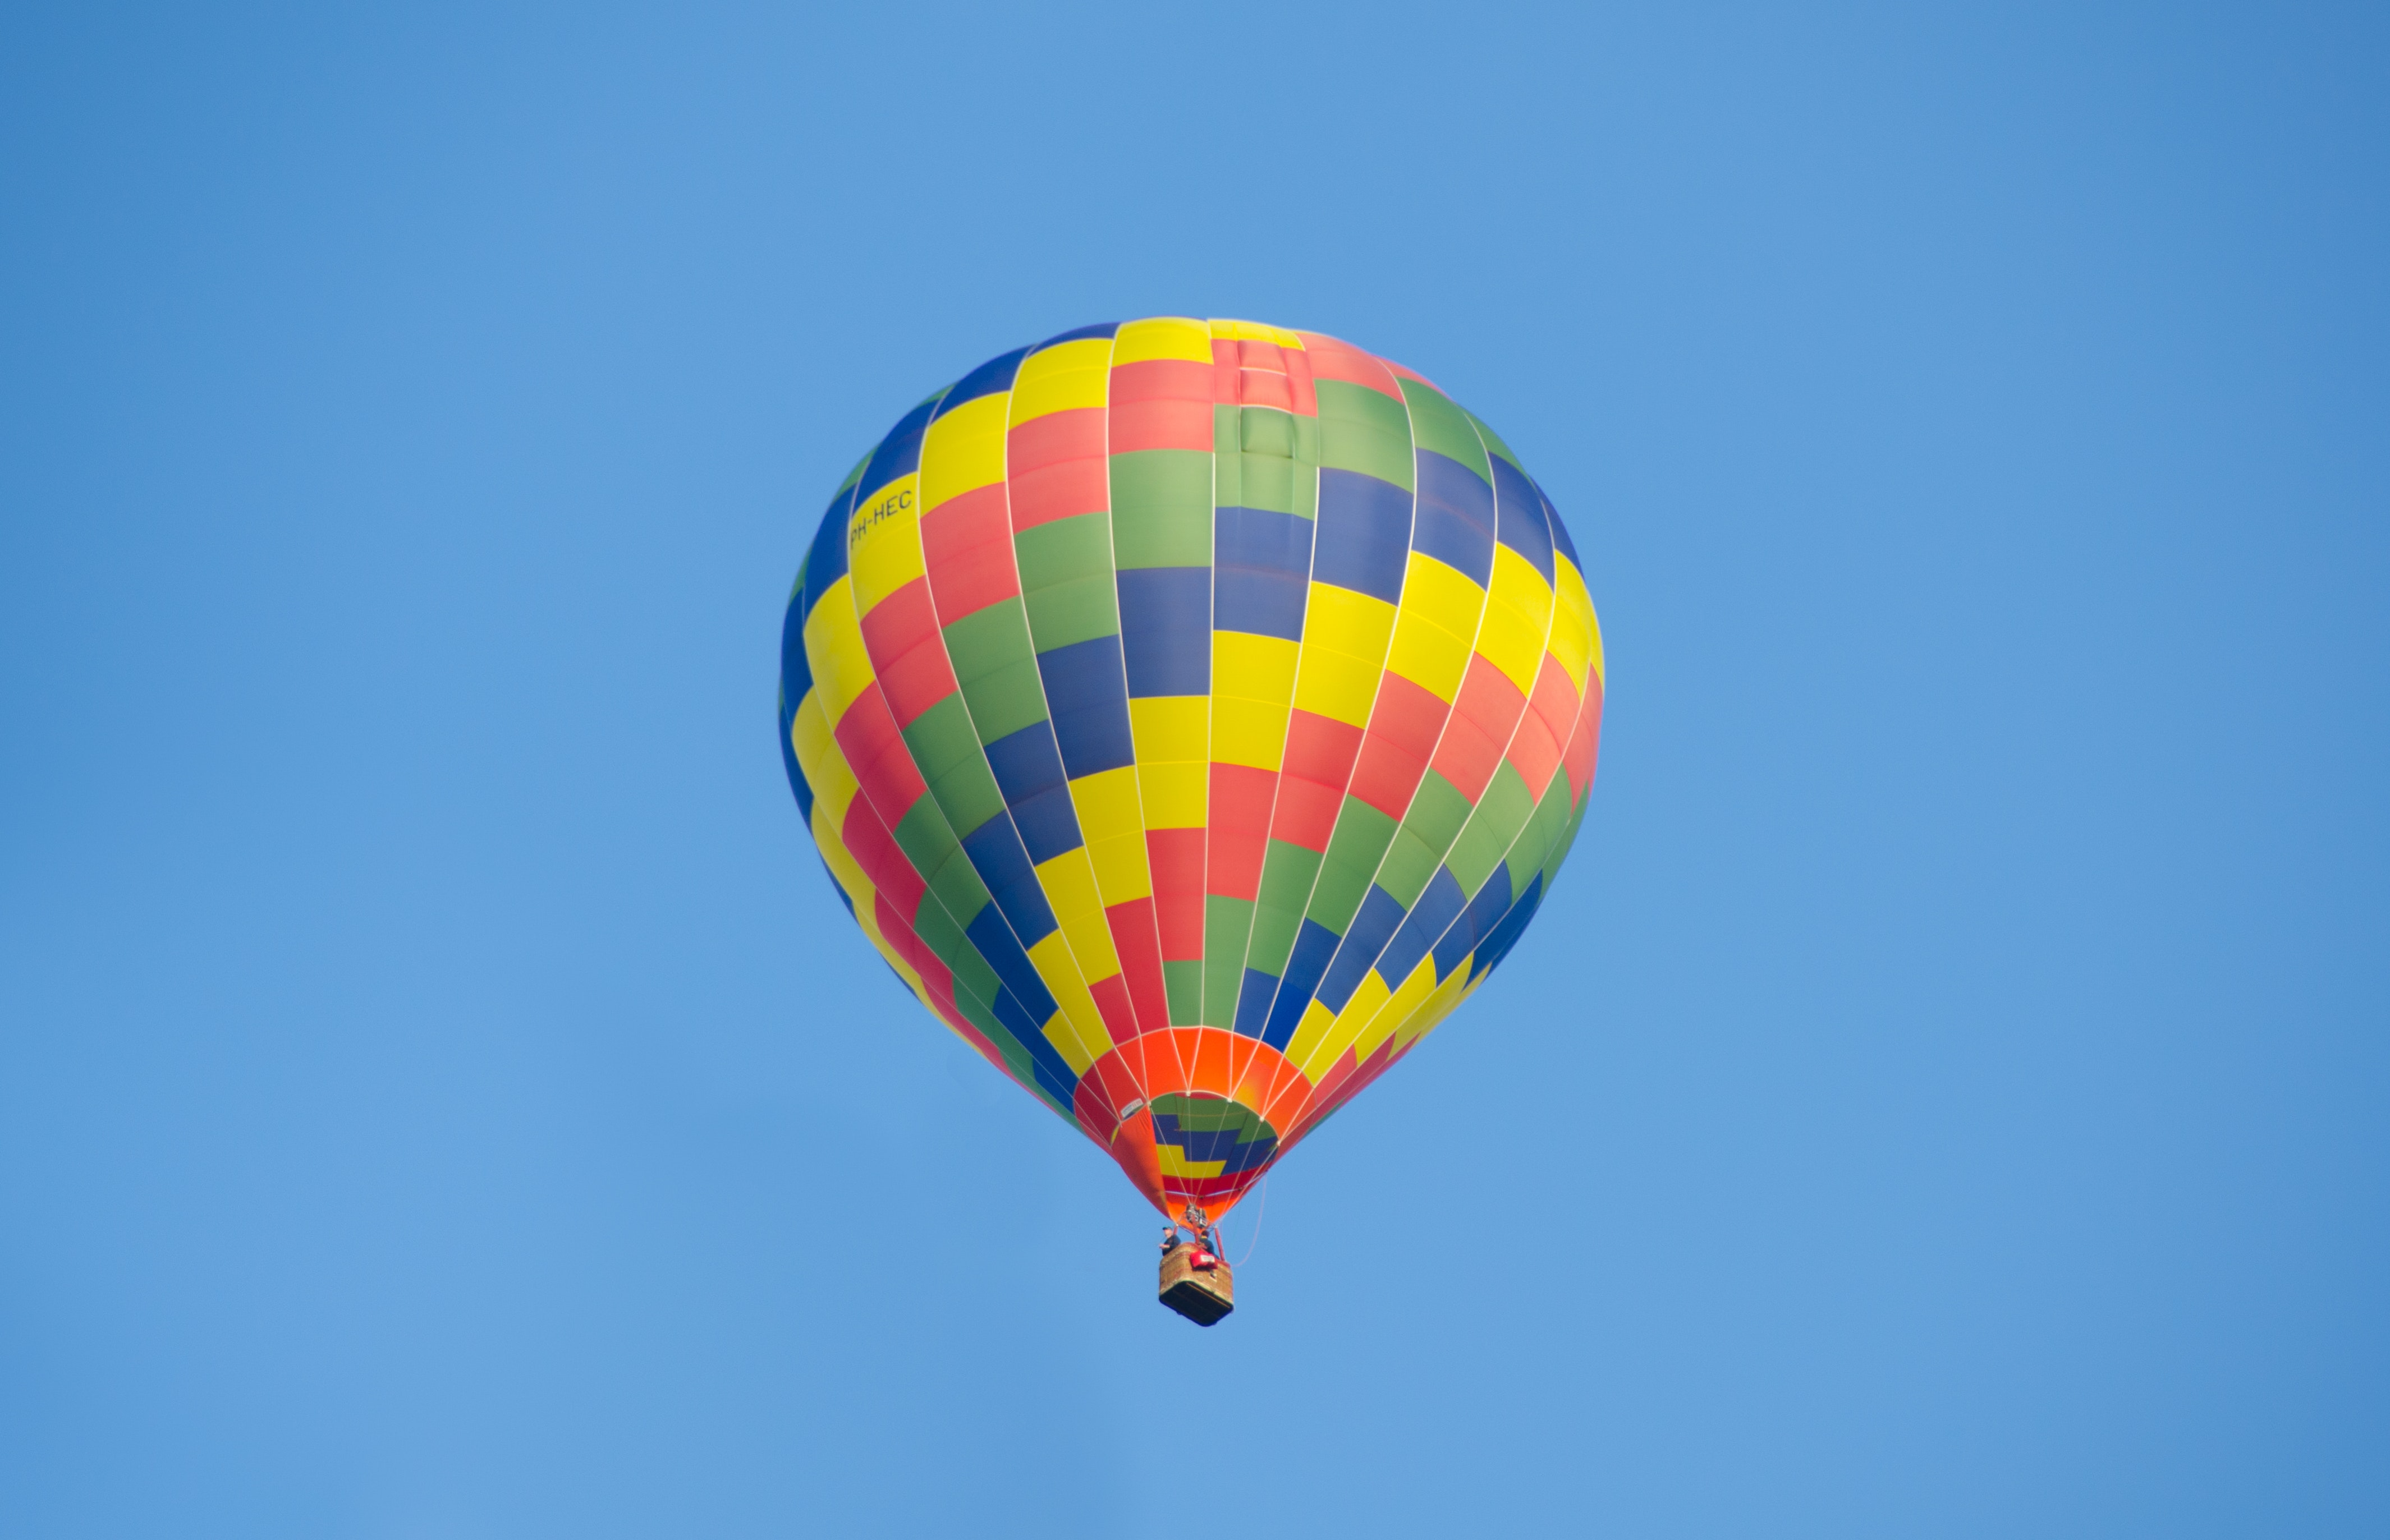 Hot Air Balloon Photo · Free Stock Photo